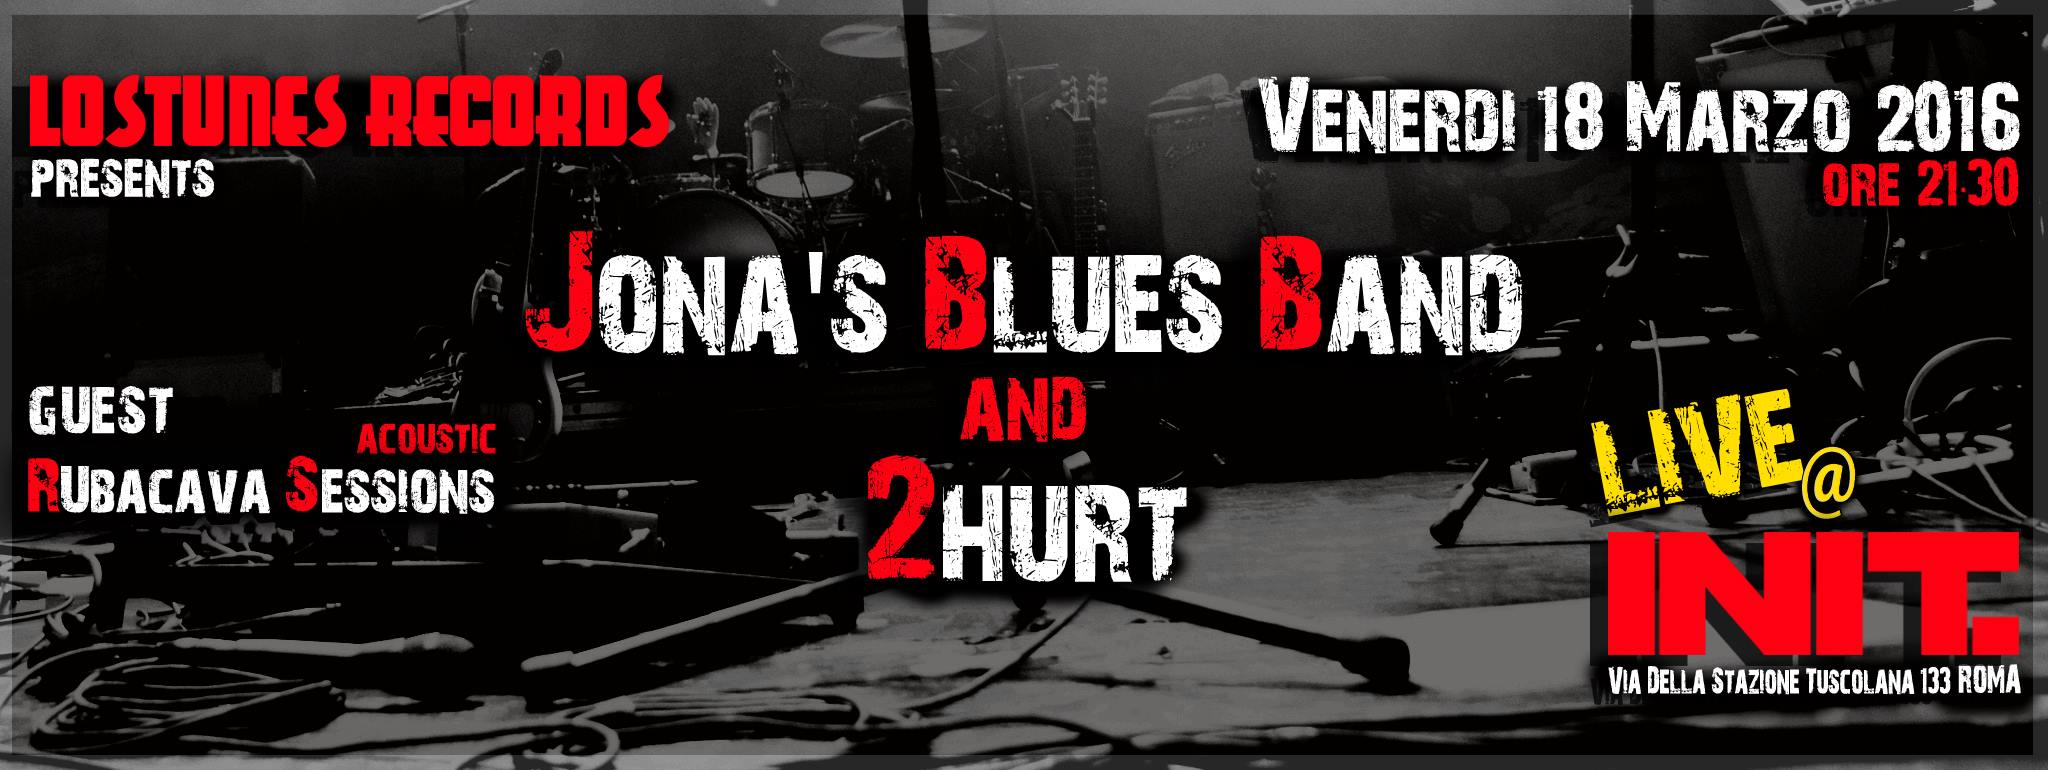 2Hurt live + Jonas' Blues Band + Rubacava Sessions @ Init - 18 03 2016